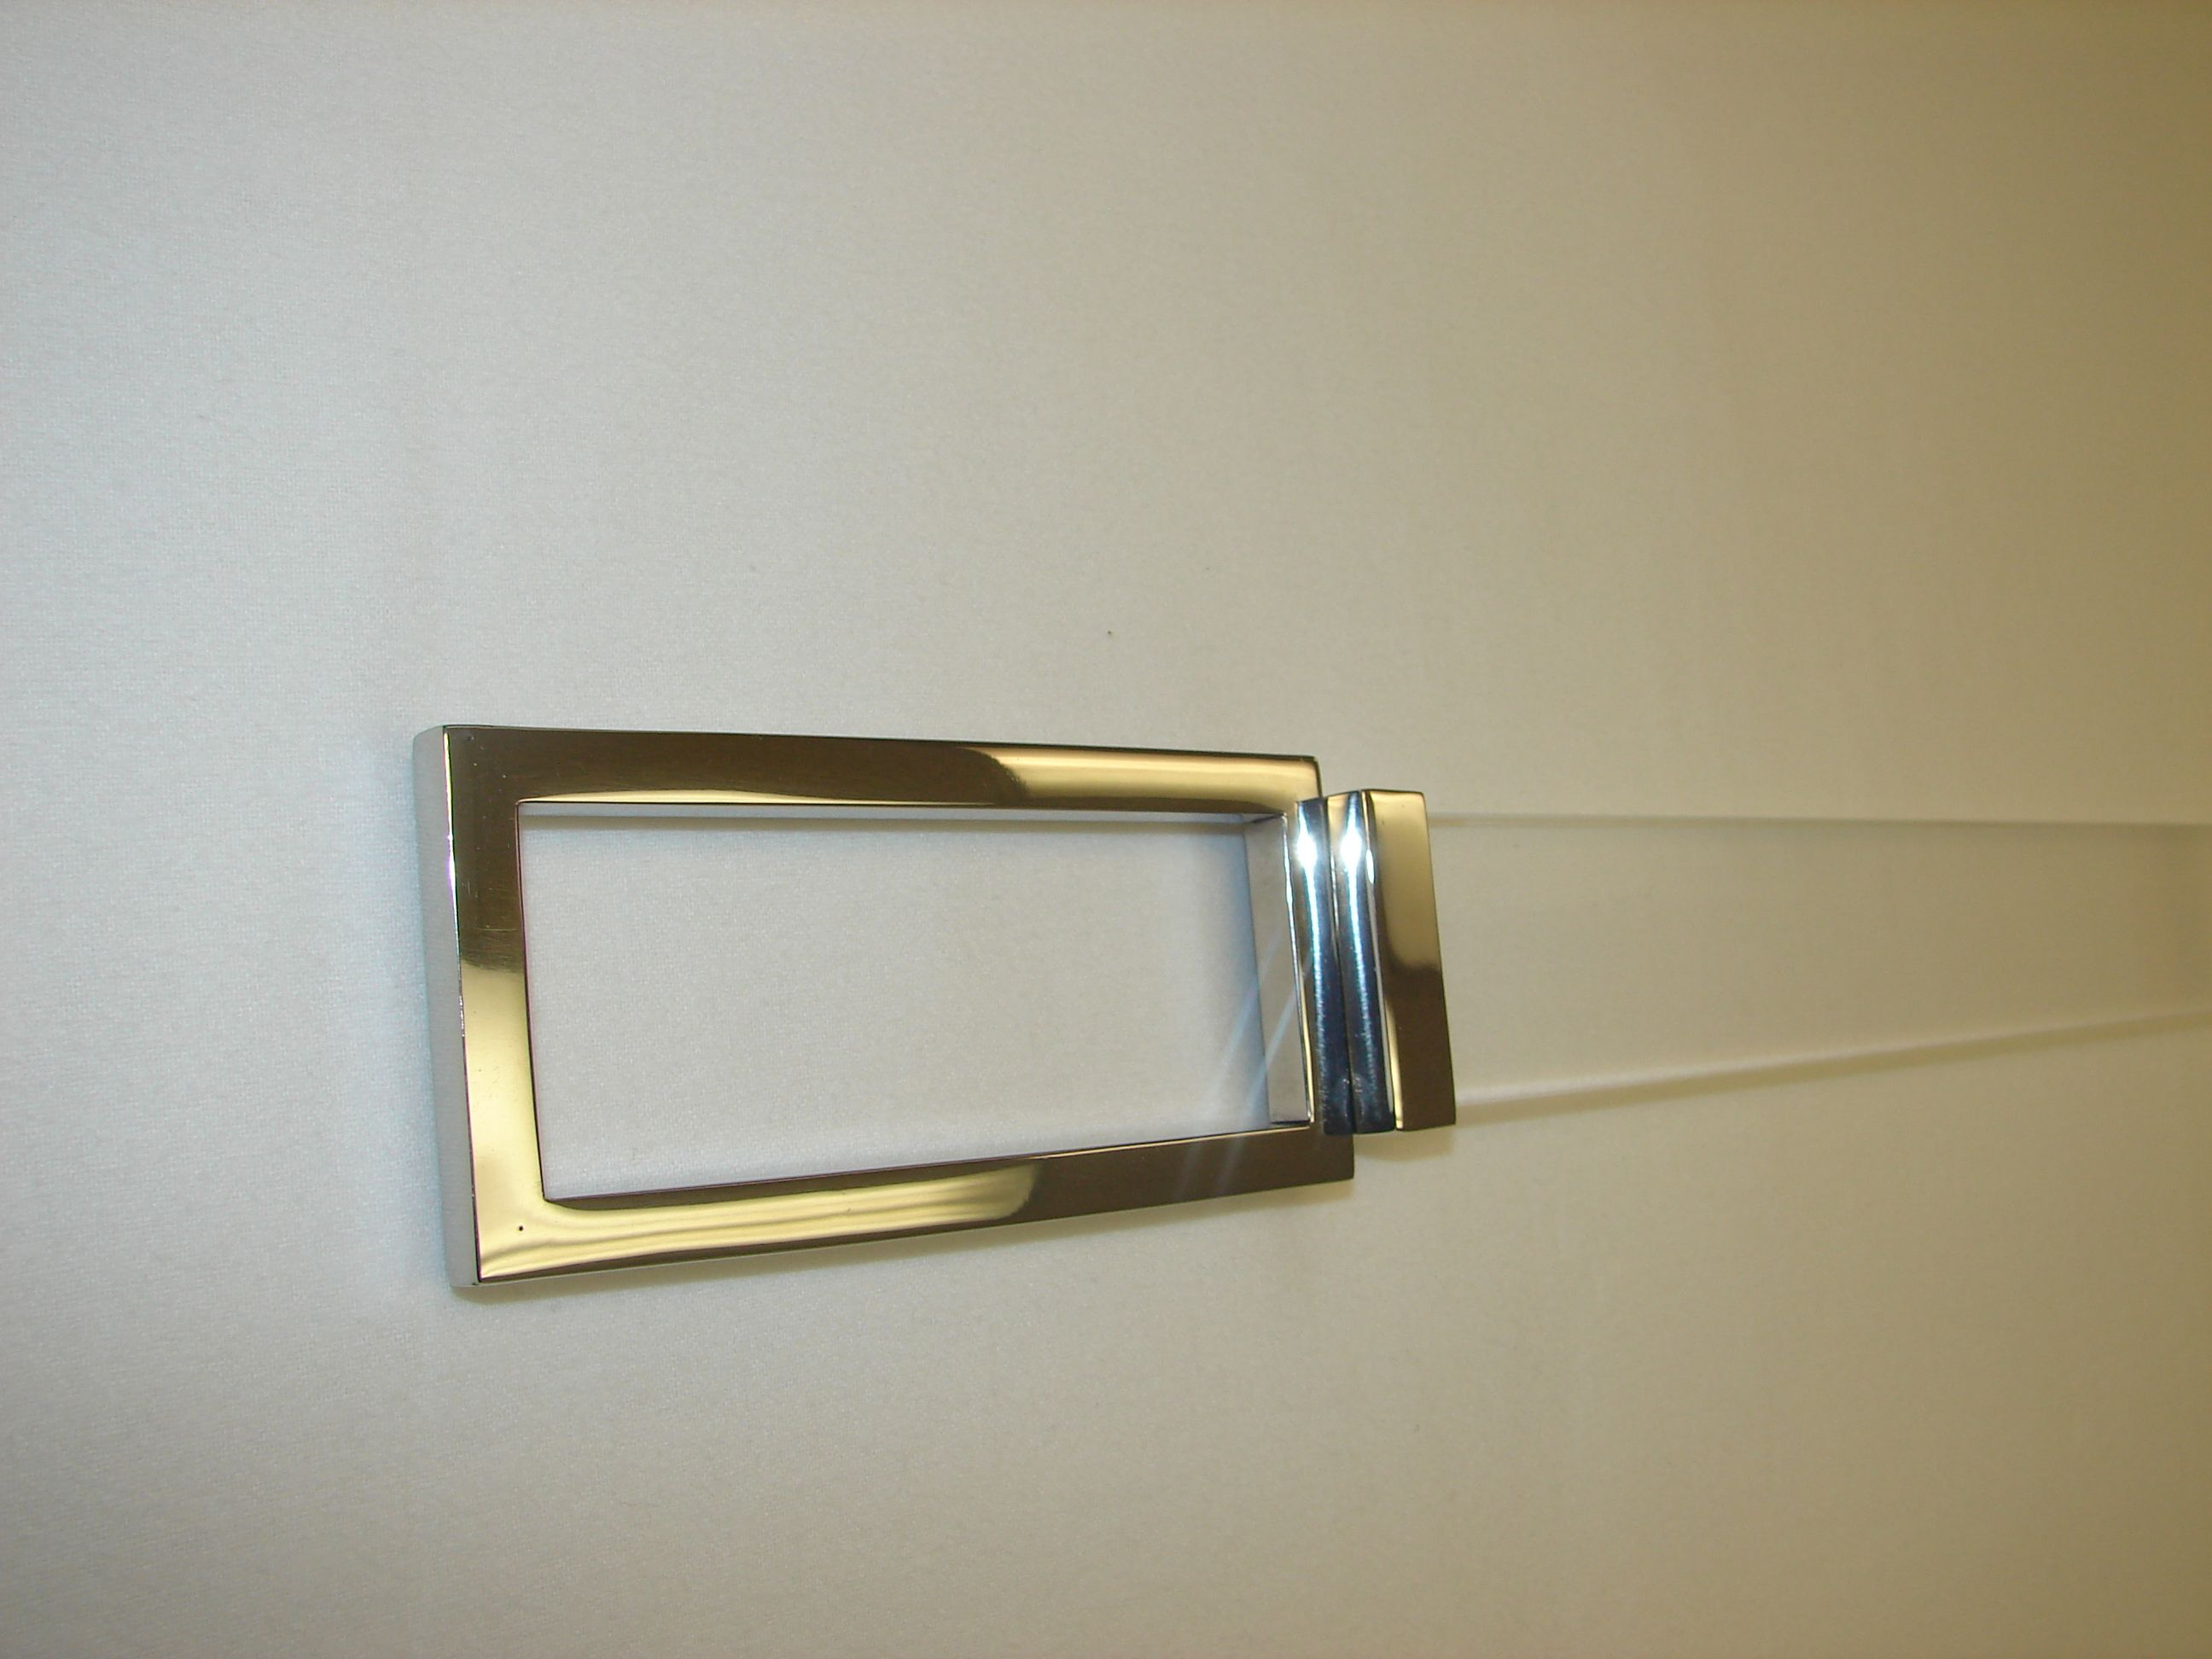 Acrylic curtain rod - Rectangular Nickel Plated Finial On Acrylic Rod Available To The Trade